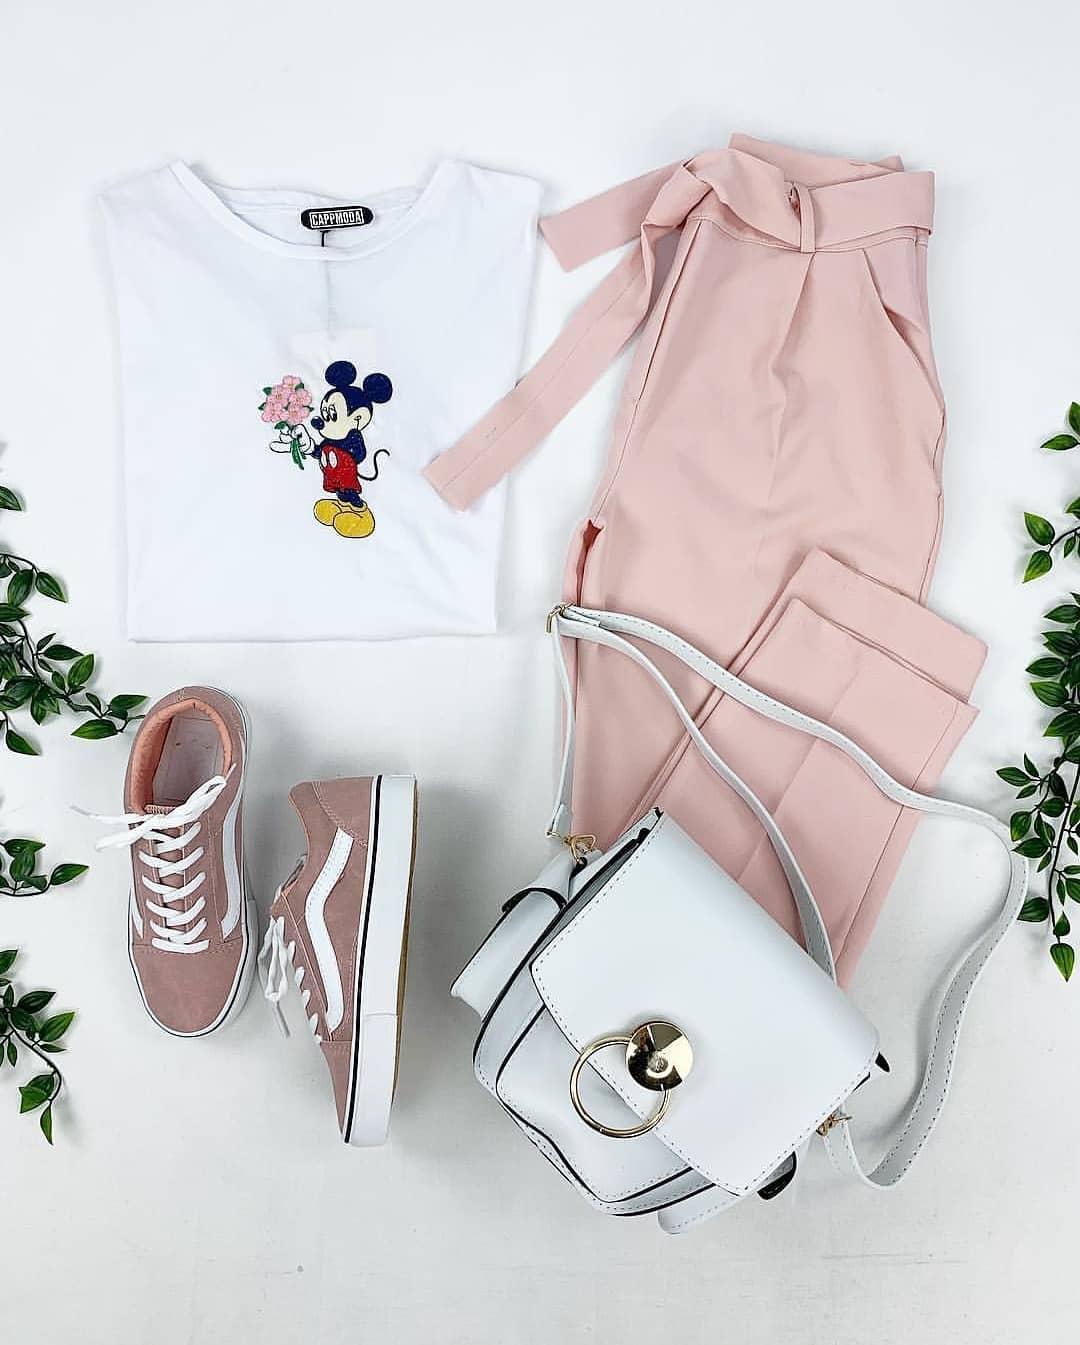 fashioninhappiness BvSWkaslvY